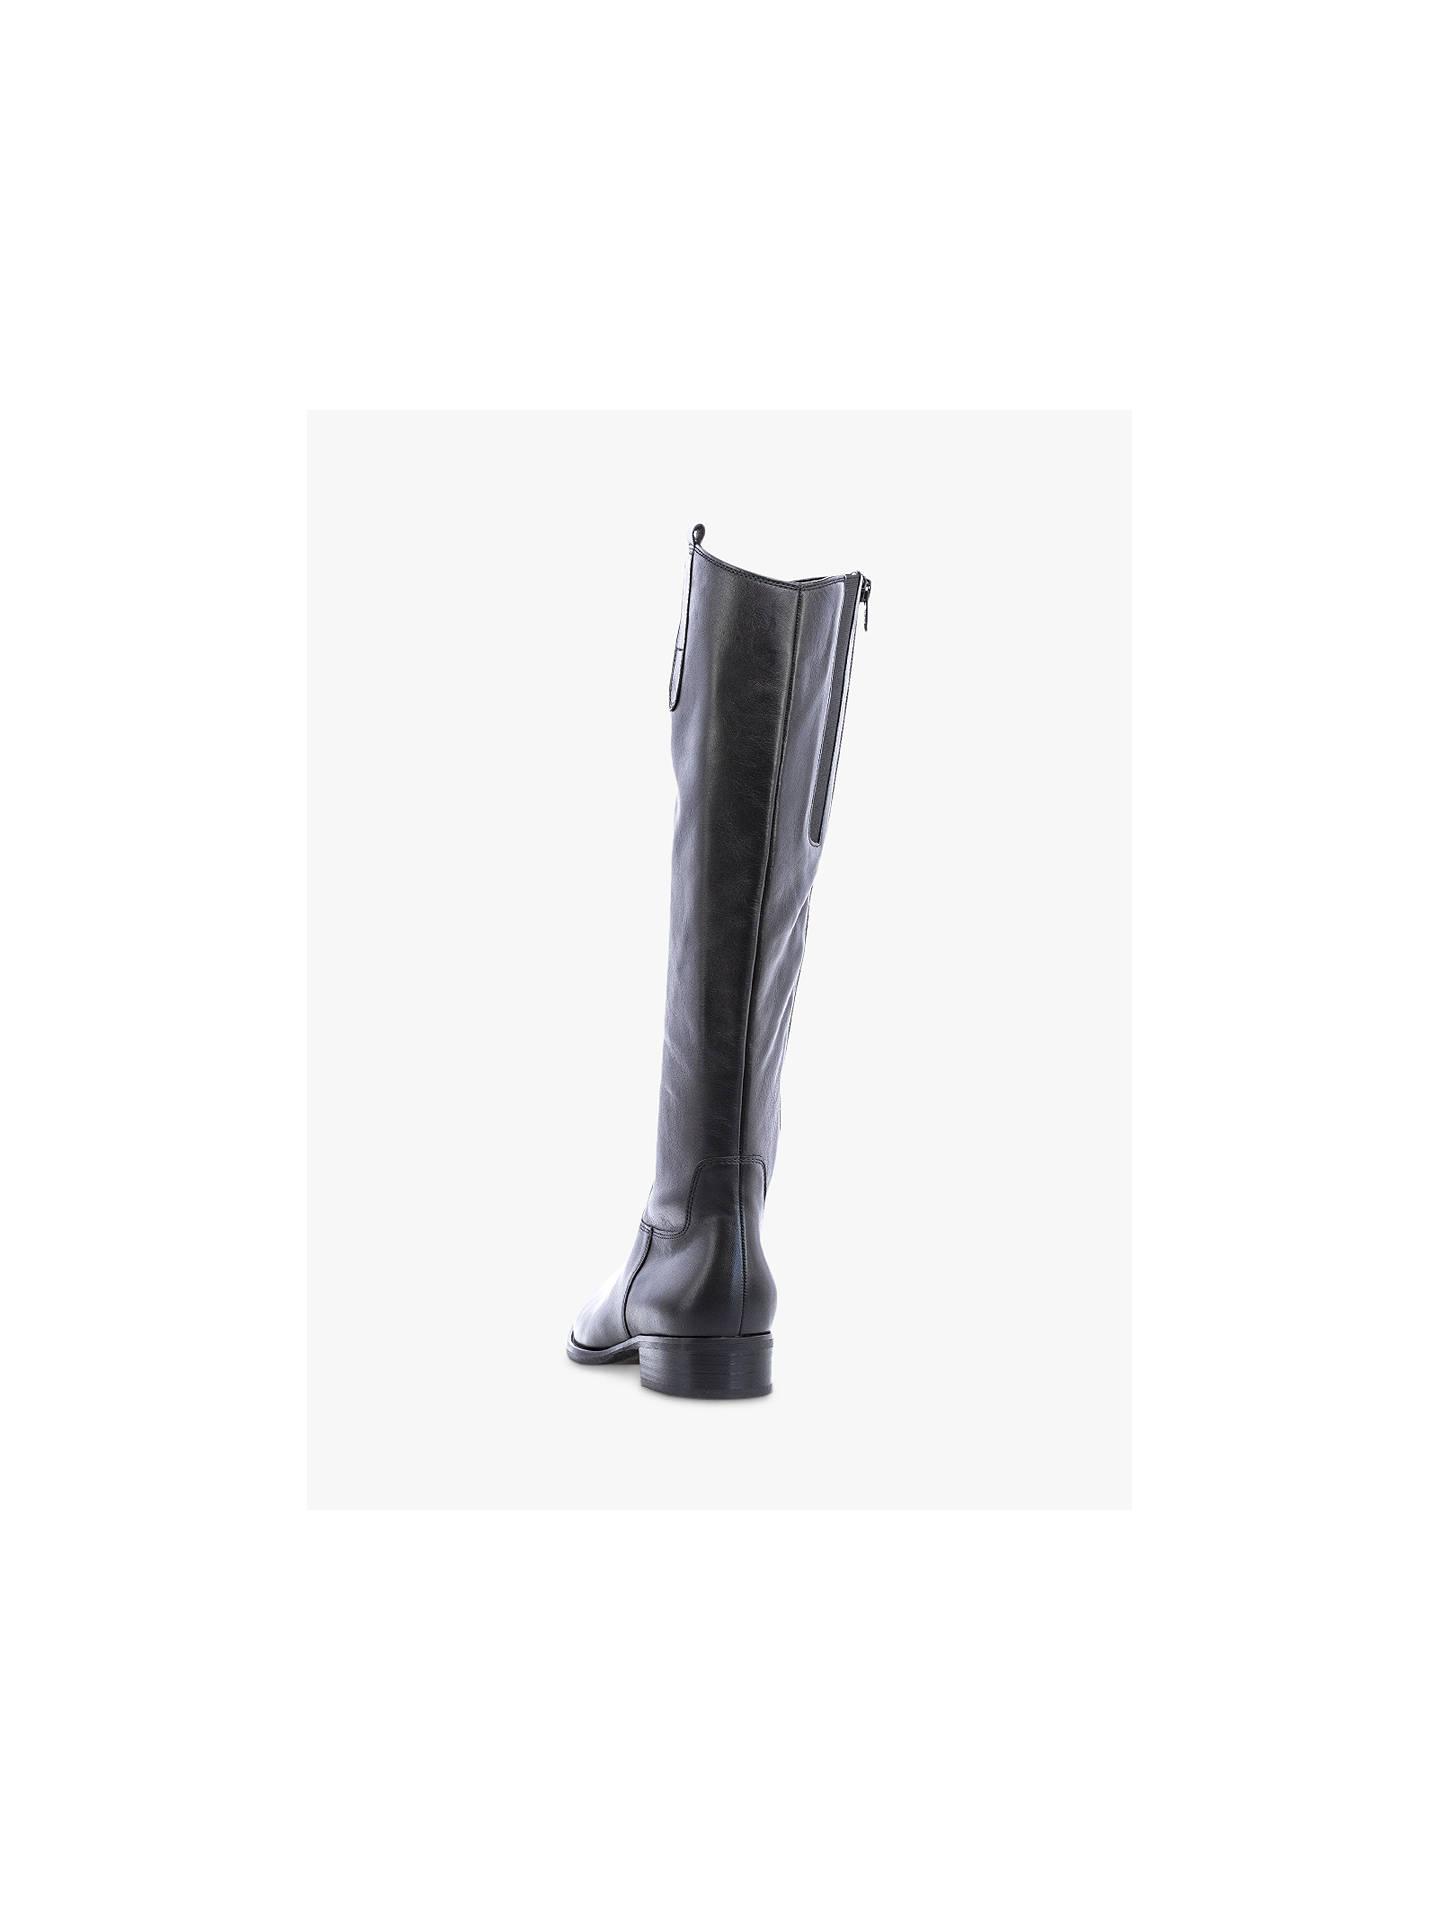 829b09d5337 ... Buy Gabor Brook Long Slim Block Heel Boots